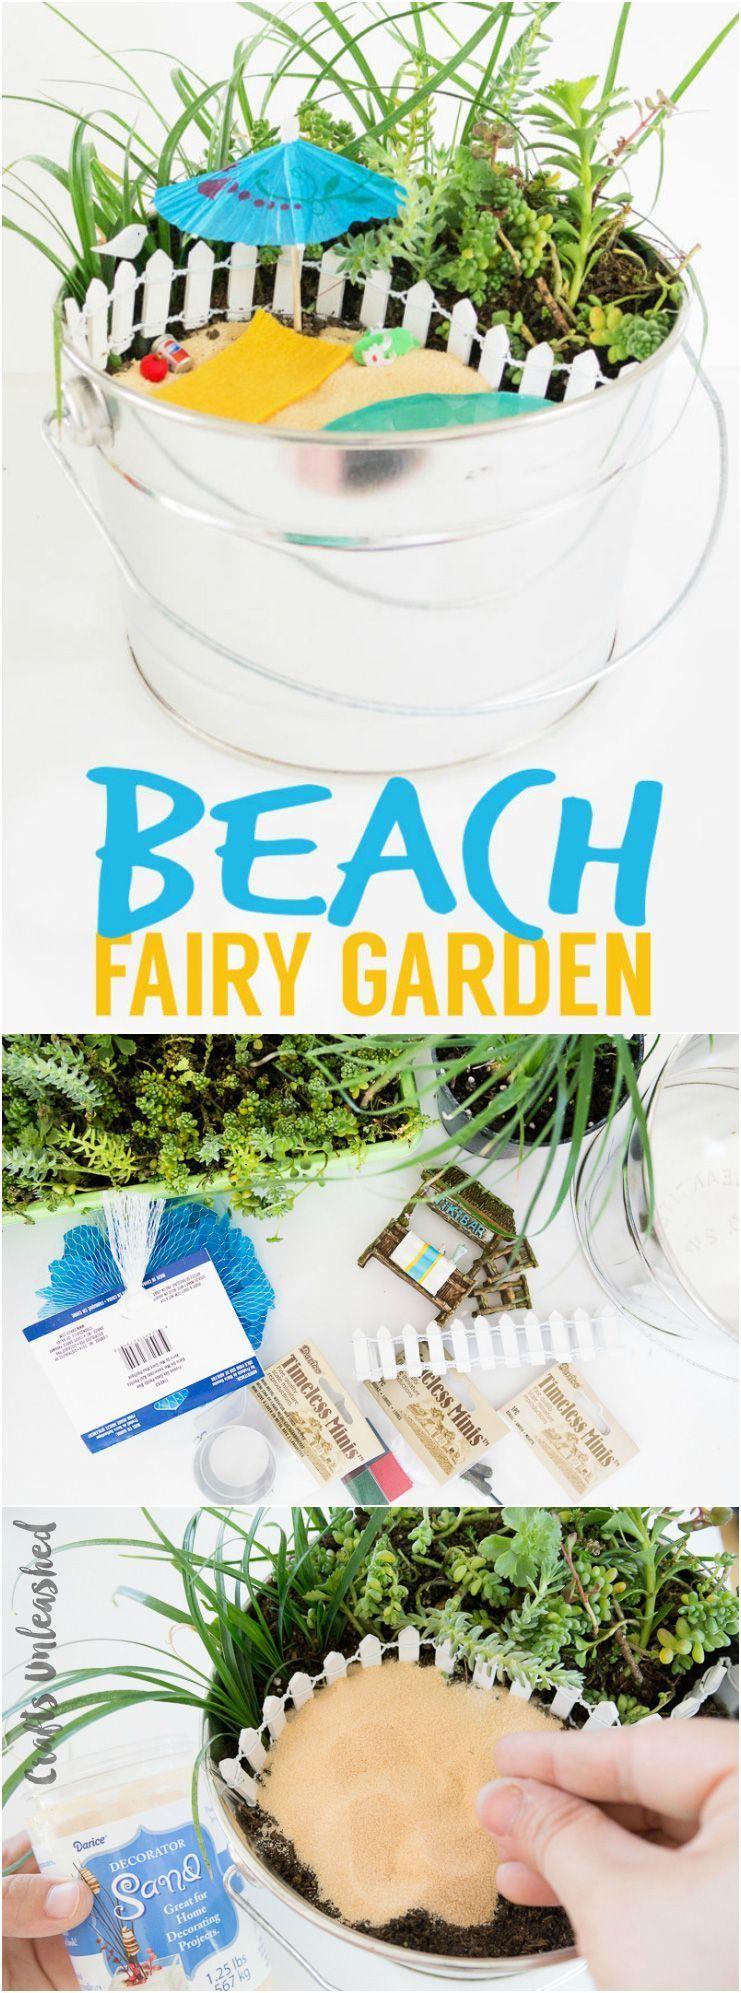 Make your own diy beach fairy garden fairygardening a fairy